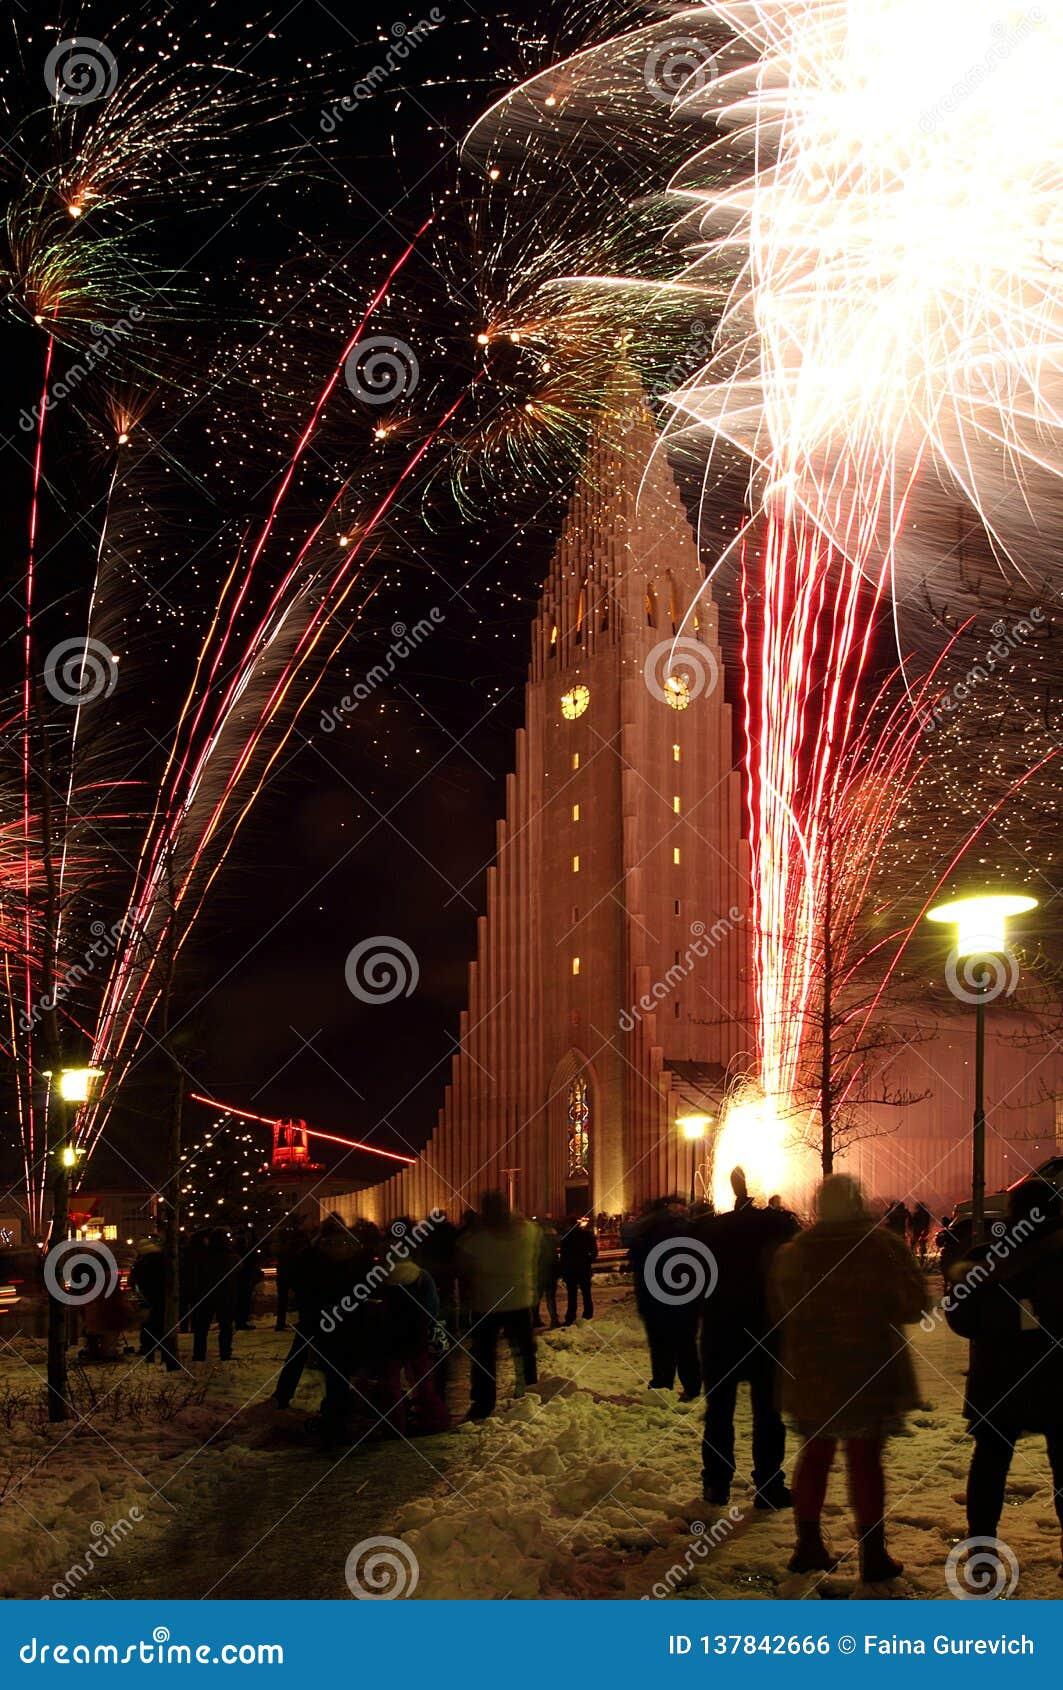 ReykjavÃk, Ισλανδία, νέα παραμονή έτους, πυροτεχνήματα κοντά σε HallgrÃmskirkja